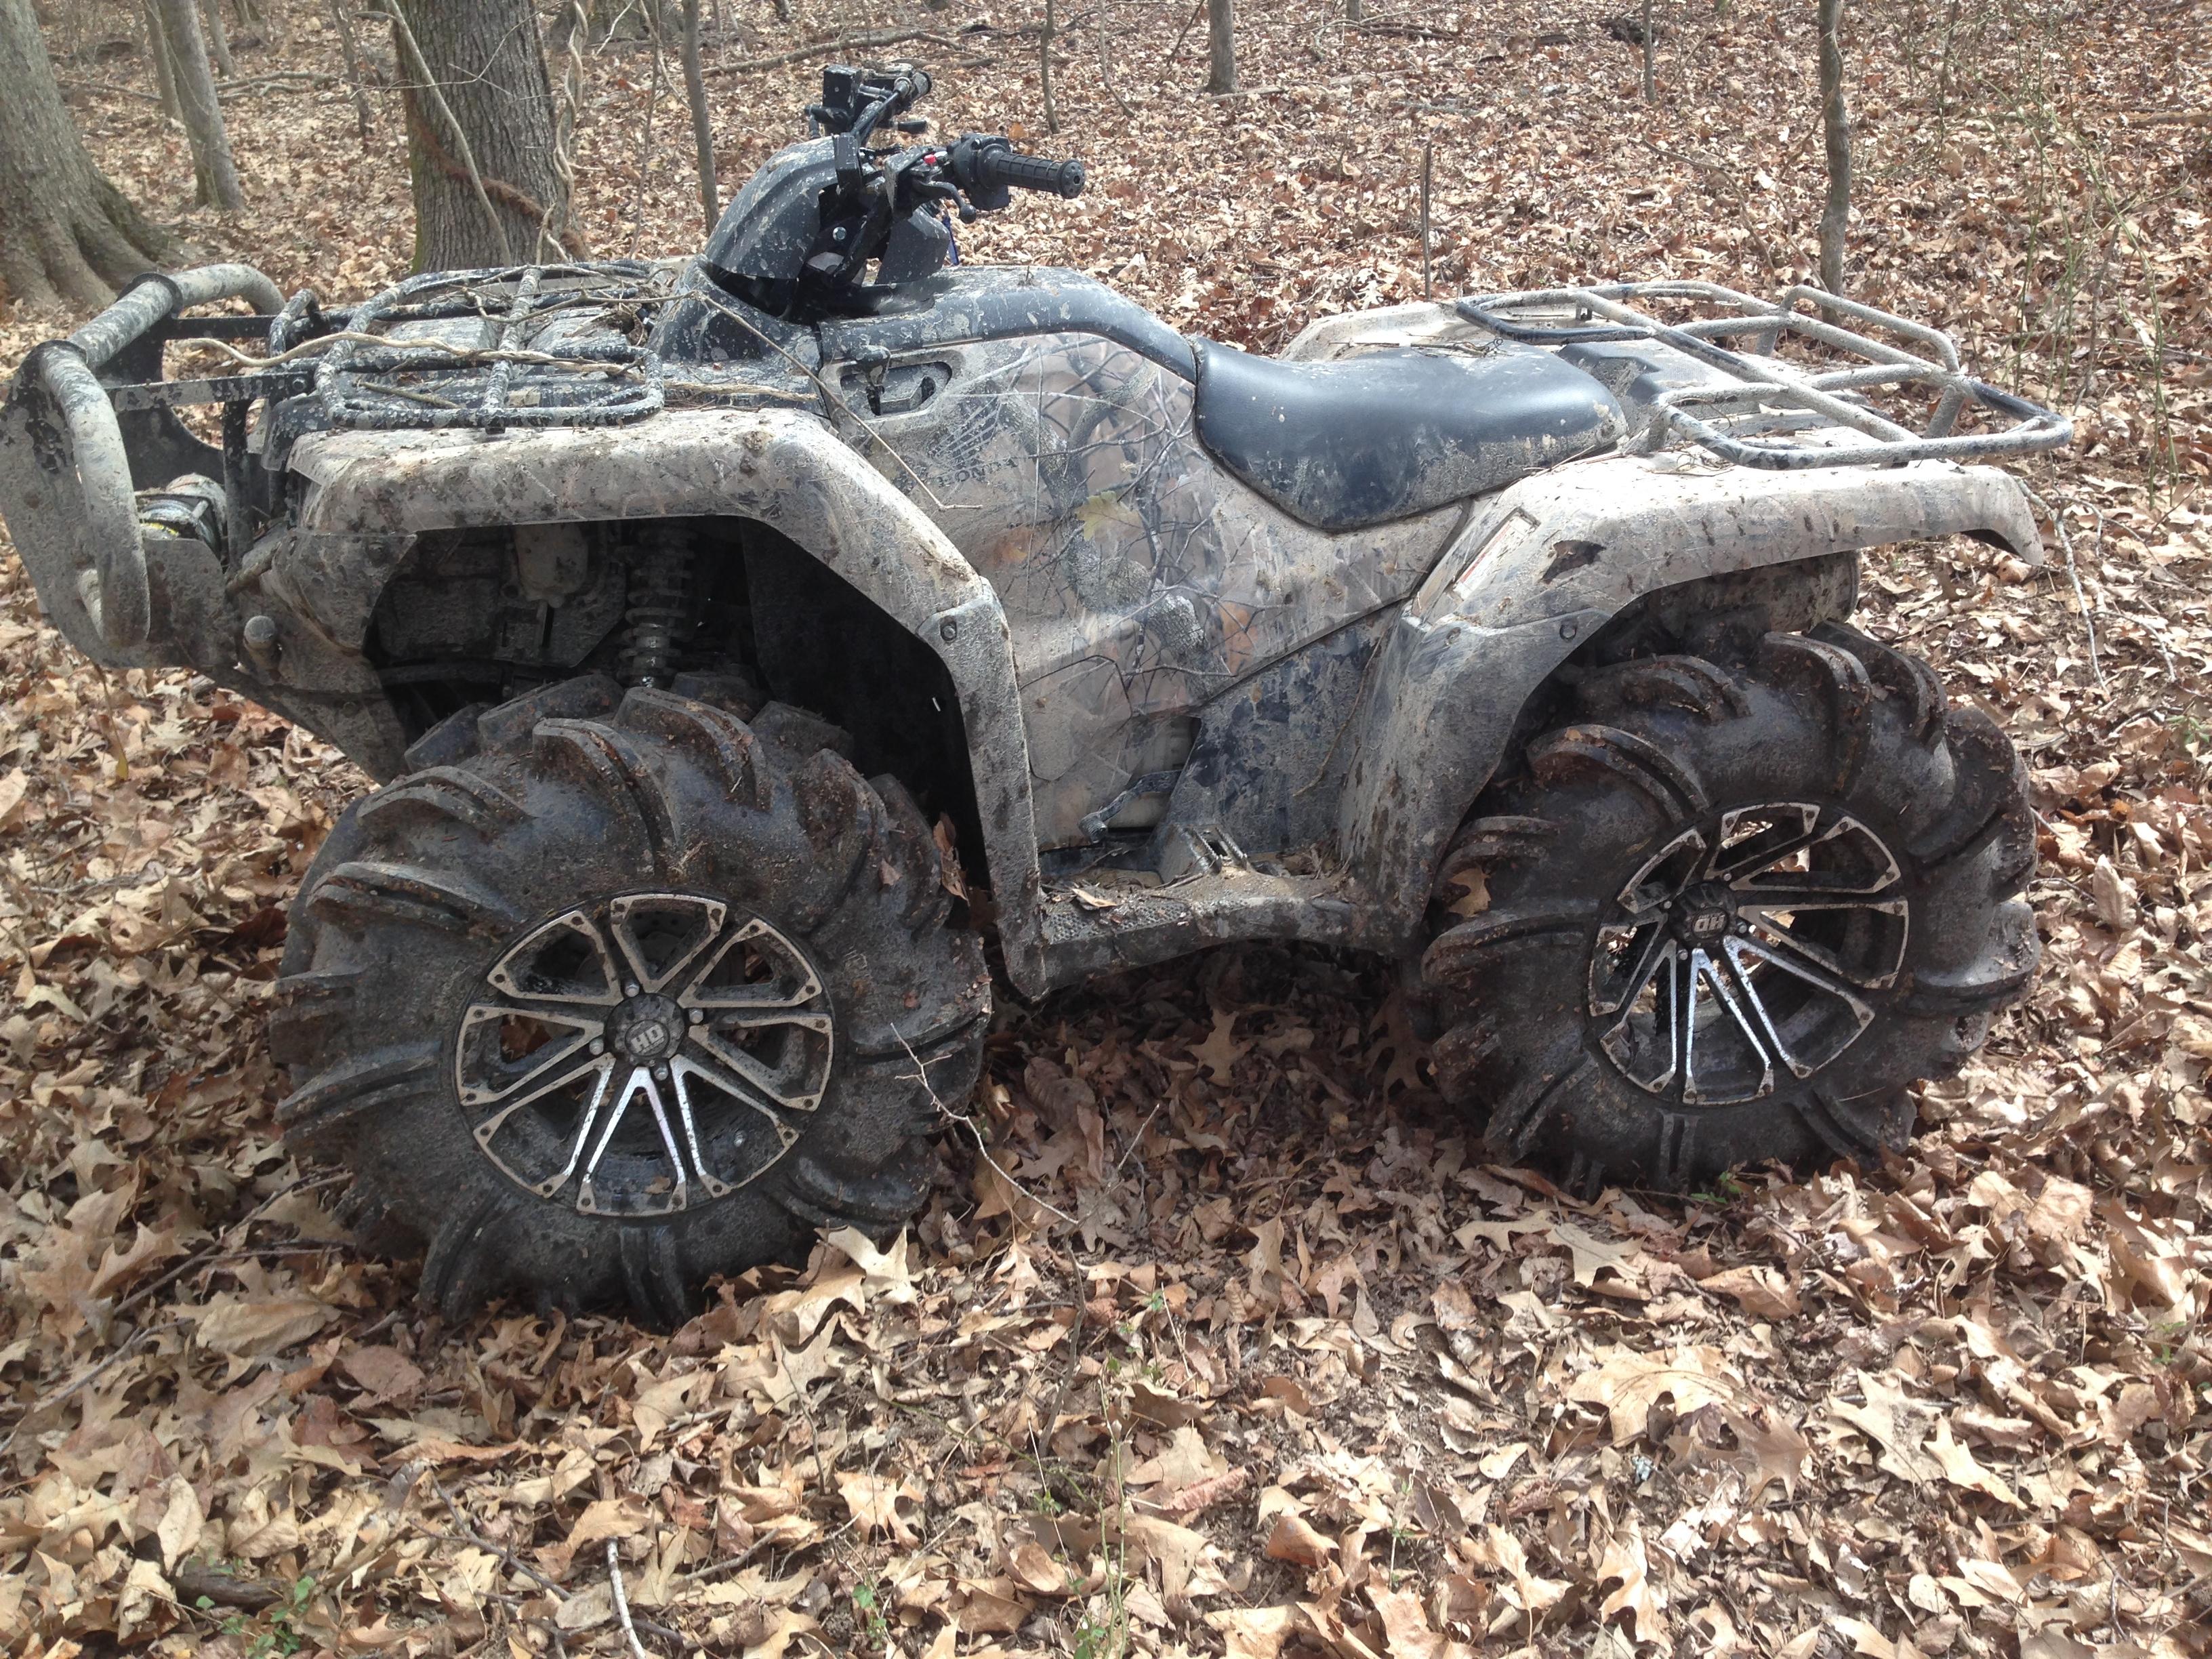 2014 Rancher FM1 build  Page 4  Honda ATV Forum